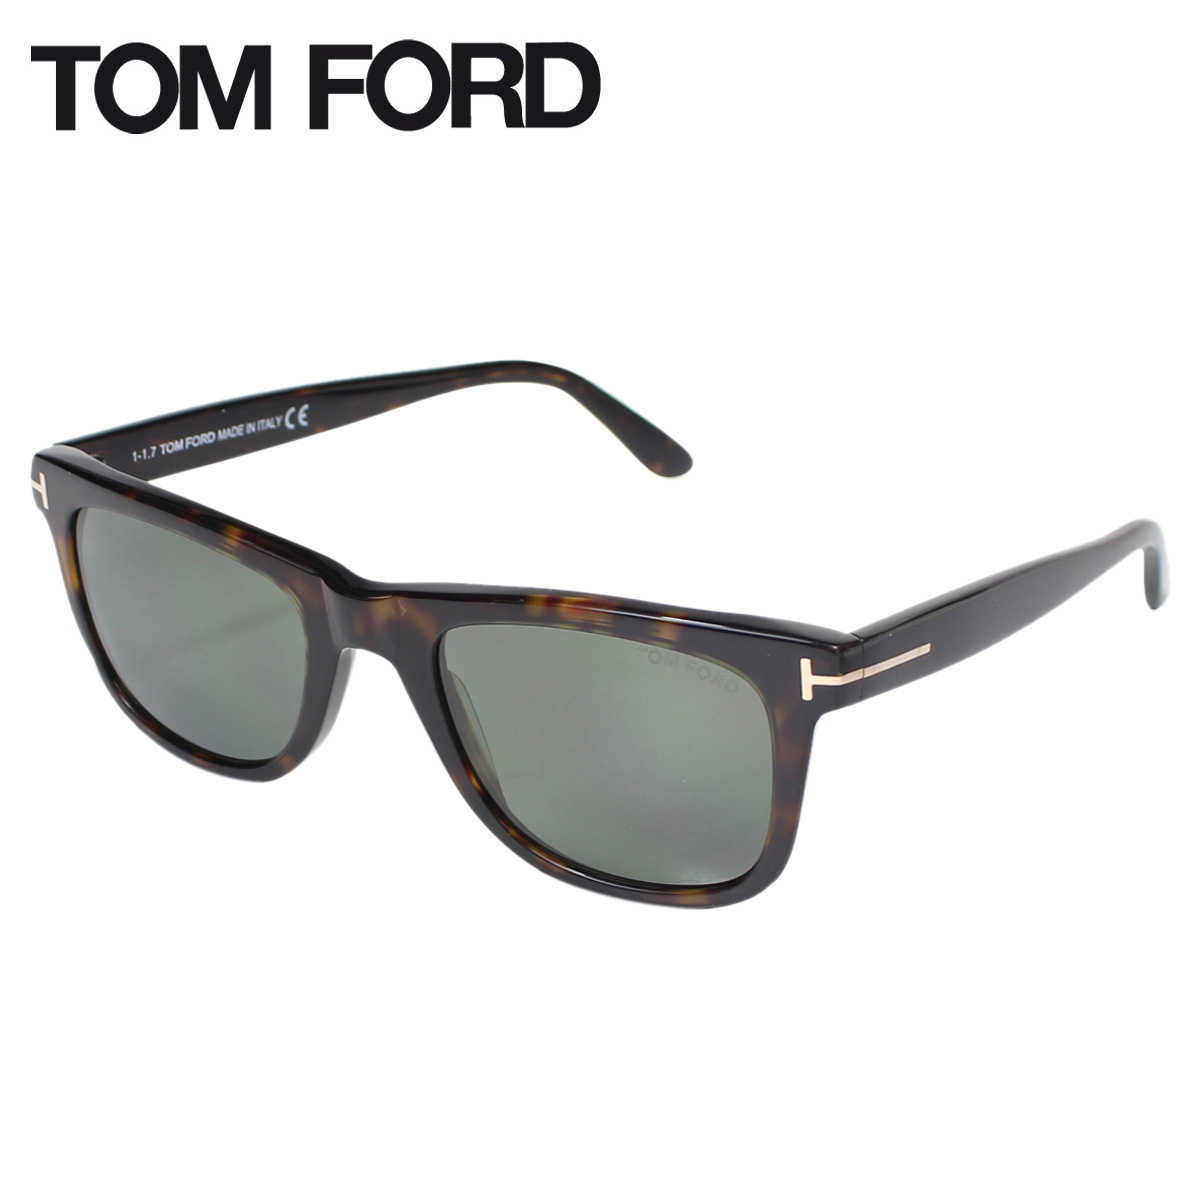 3f273536127f Tom Ford TOM FORD sunglasses glasses men gap Dis eyewear FT0336 LEO SQUARE SUNGLASSES  brown  8 3 Shinnyu load